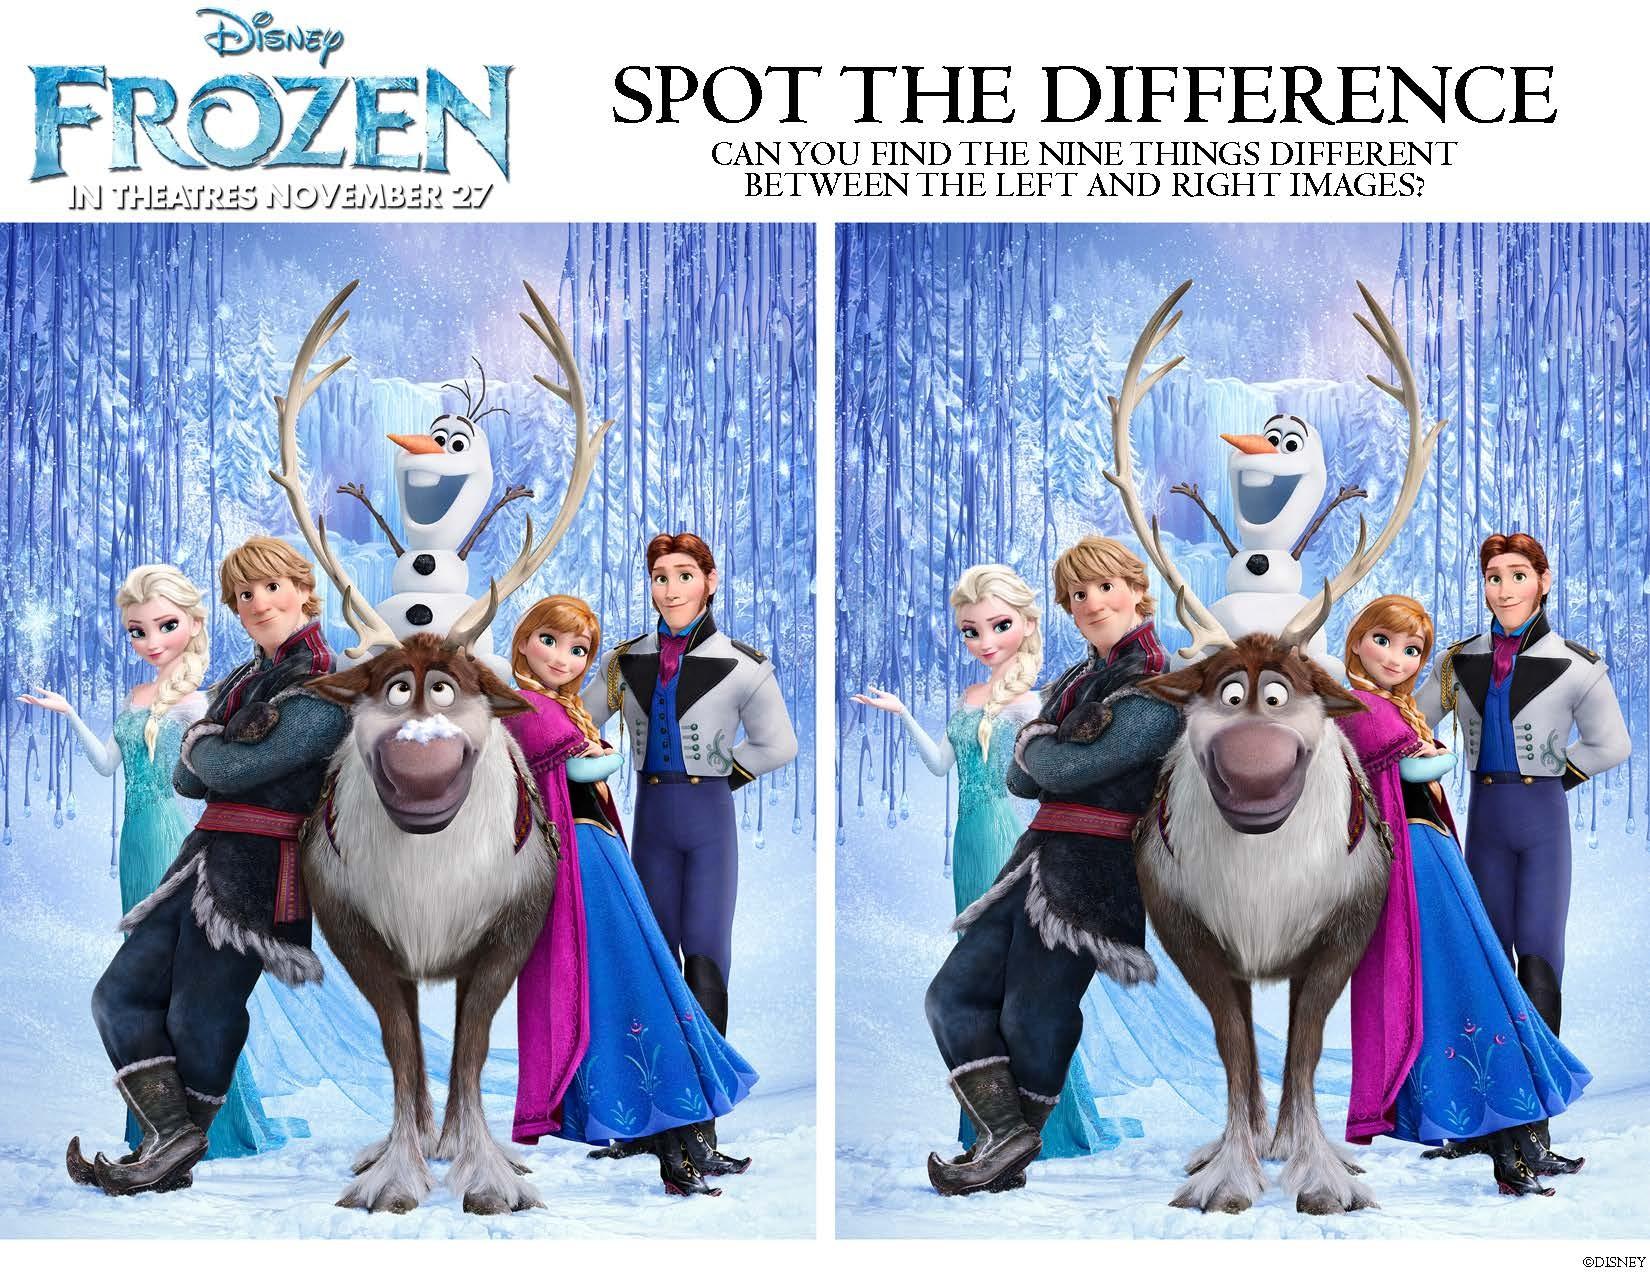 Disney's Frozen: Printable Activities And Games For Kids - Free Printable Disney Stories